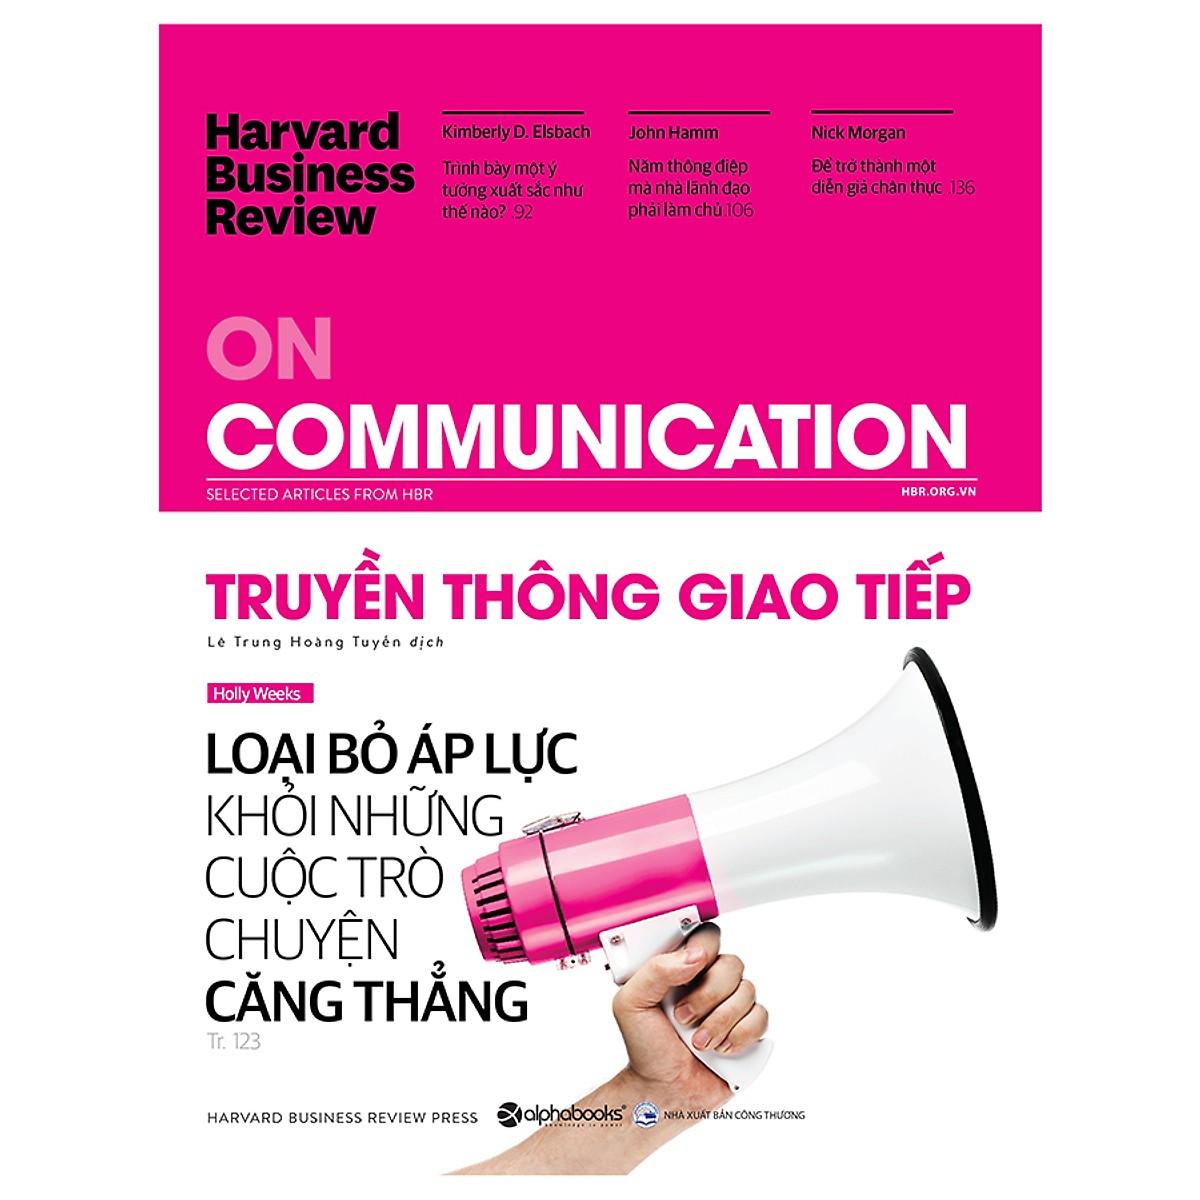 HBR On Communication - Truyền Thông Giao Tiếp Tặng BookMark Romantic